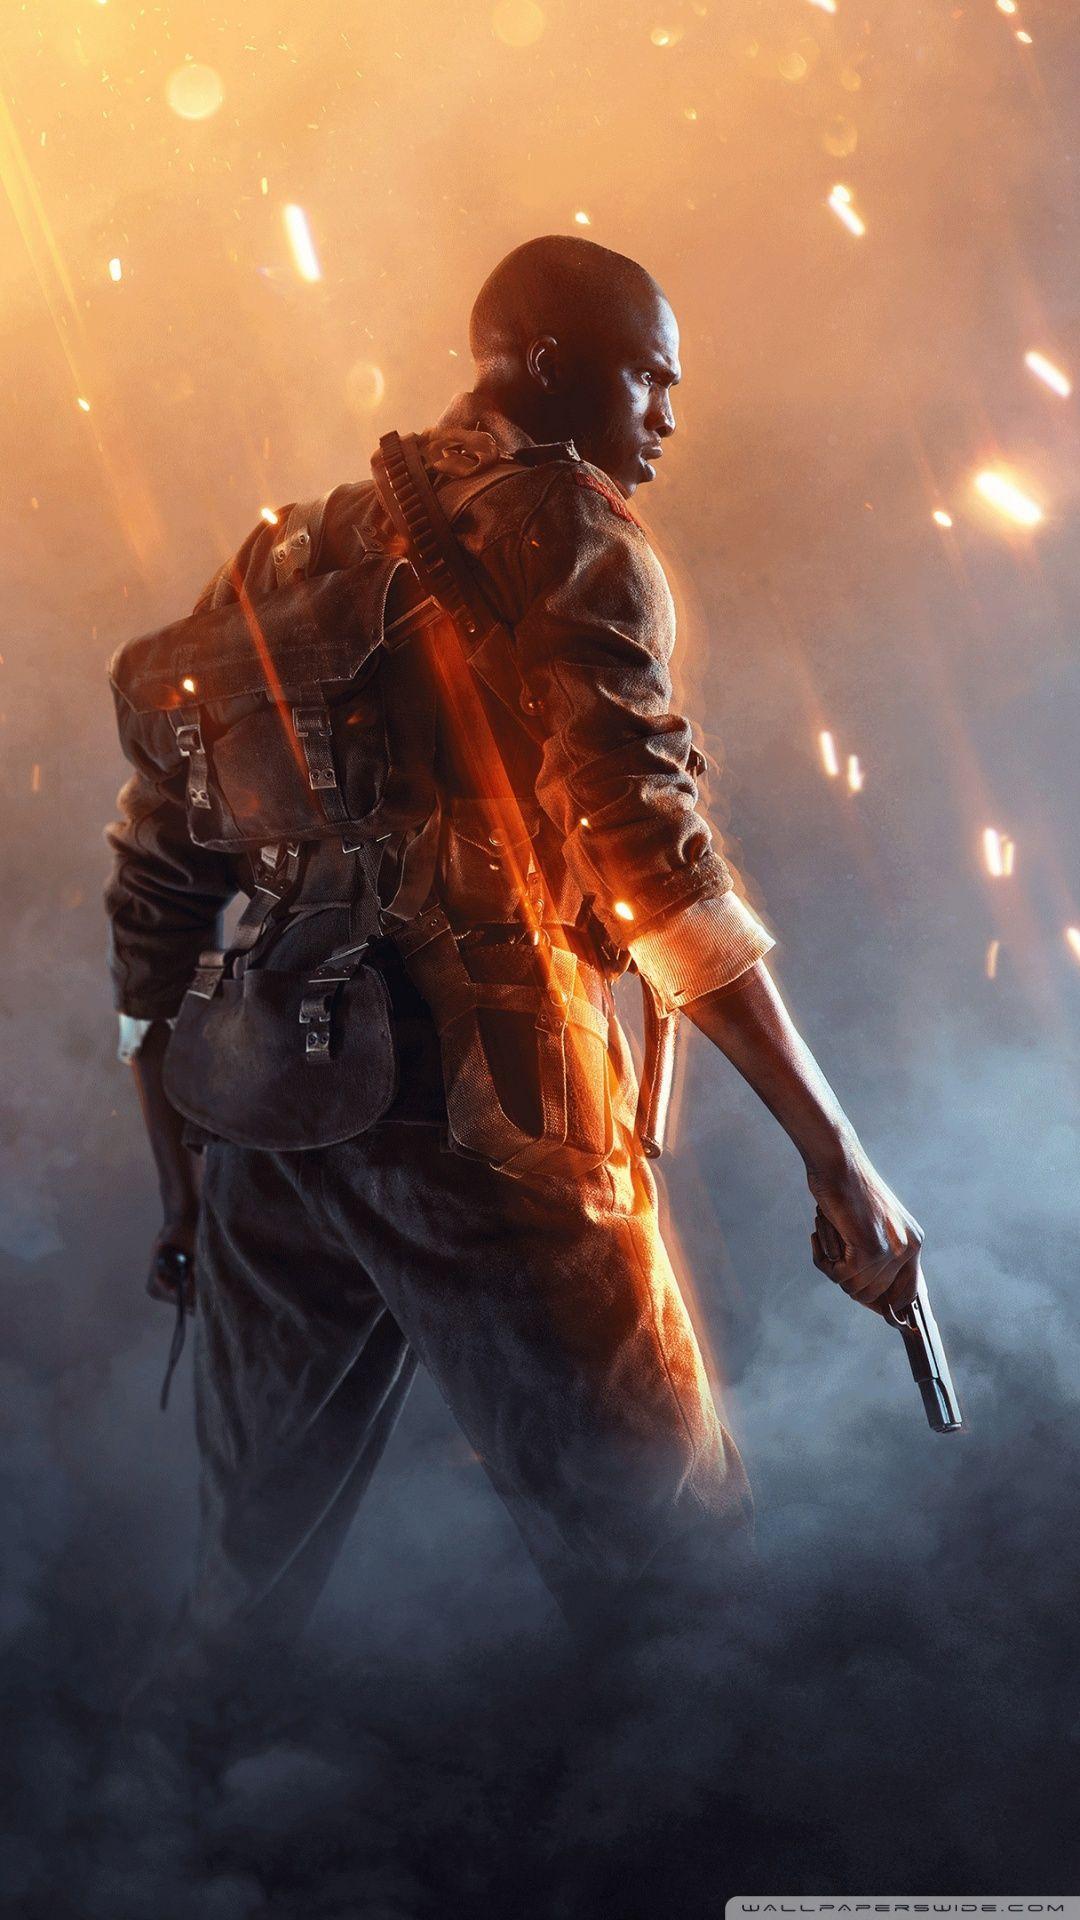 Battlefield V Iphone Wallpapers Top Free Battlefield V